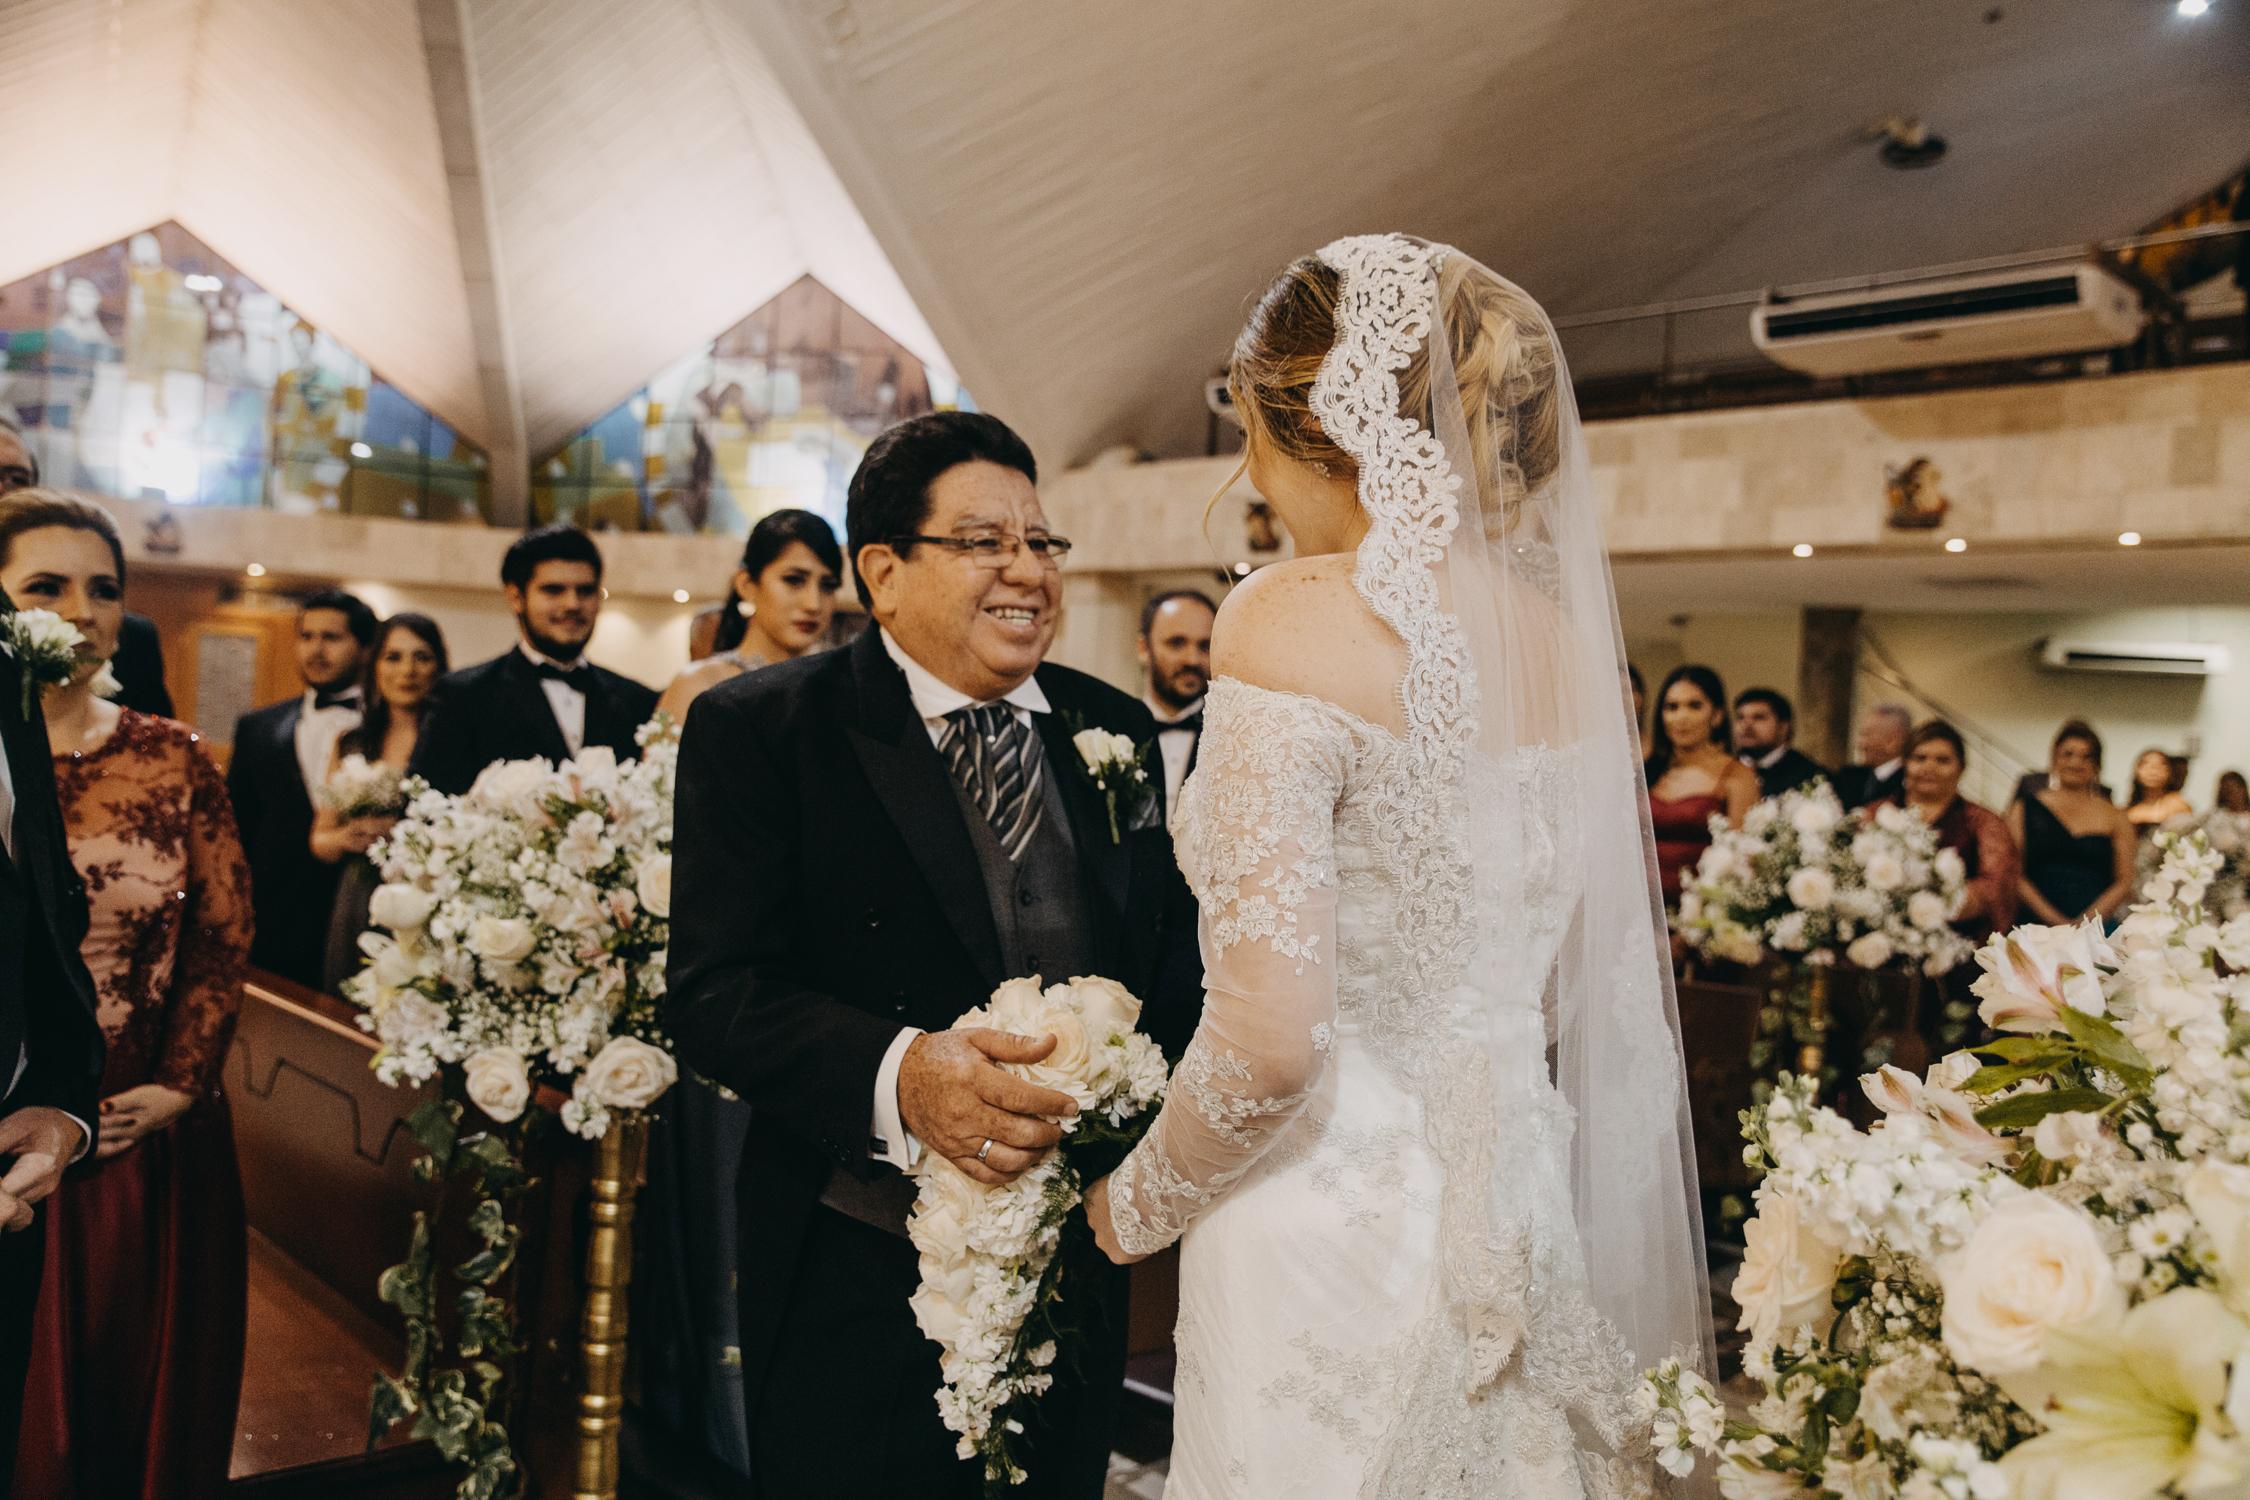 Michelle-Agurto-Fotografia-Bodas-Ecuador-Destination-Wedding-Photographer-Vicky-Javier-52.JPG